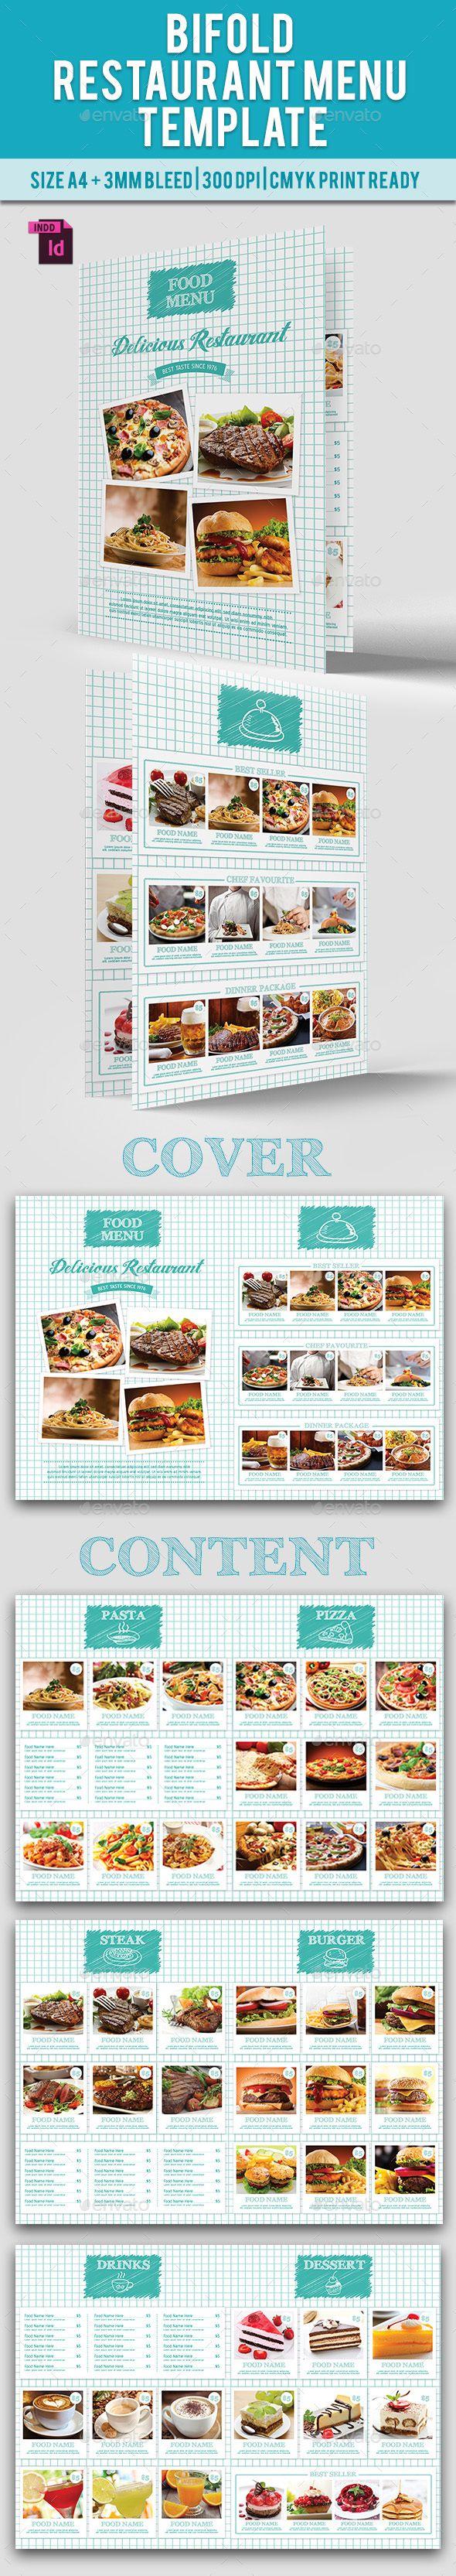 BiFold Restaurant Menu Template InDesign INDD. Download here: http://graphicriver.net/item/bifold-restaurant-menu-vol-10/15568691?ref=ksioks